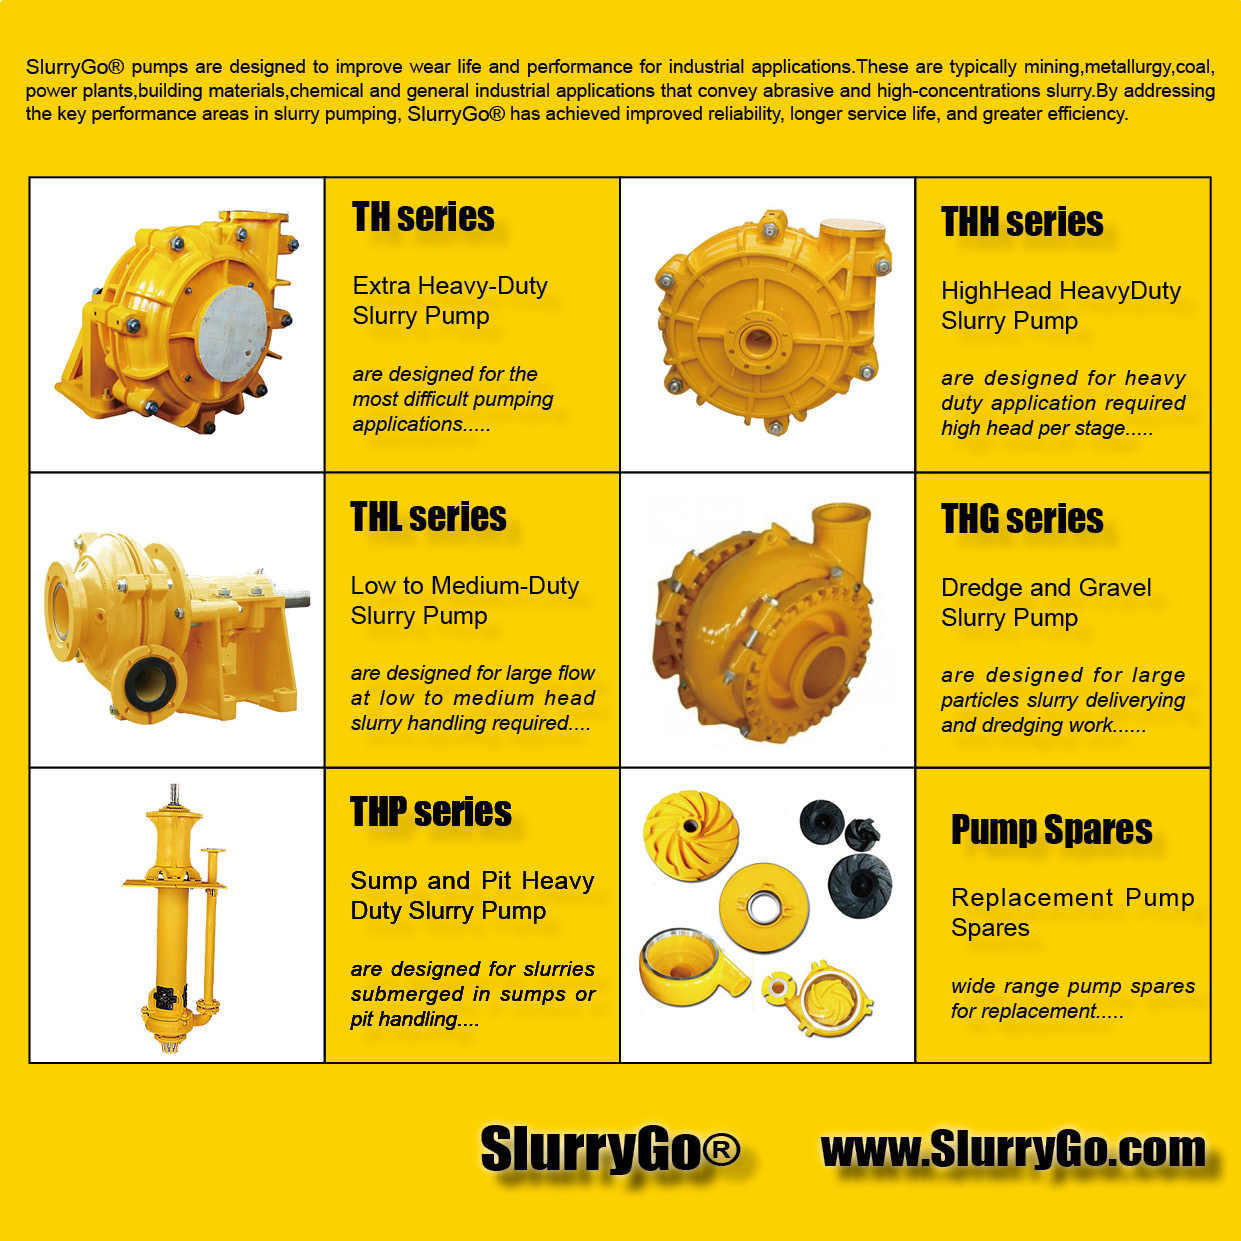 SlurryGo Slurry Pumps Dredging Pumps Replacement Warman